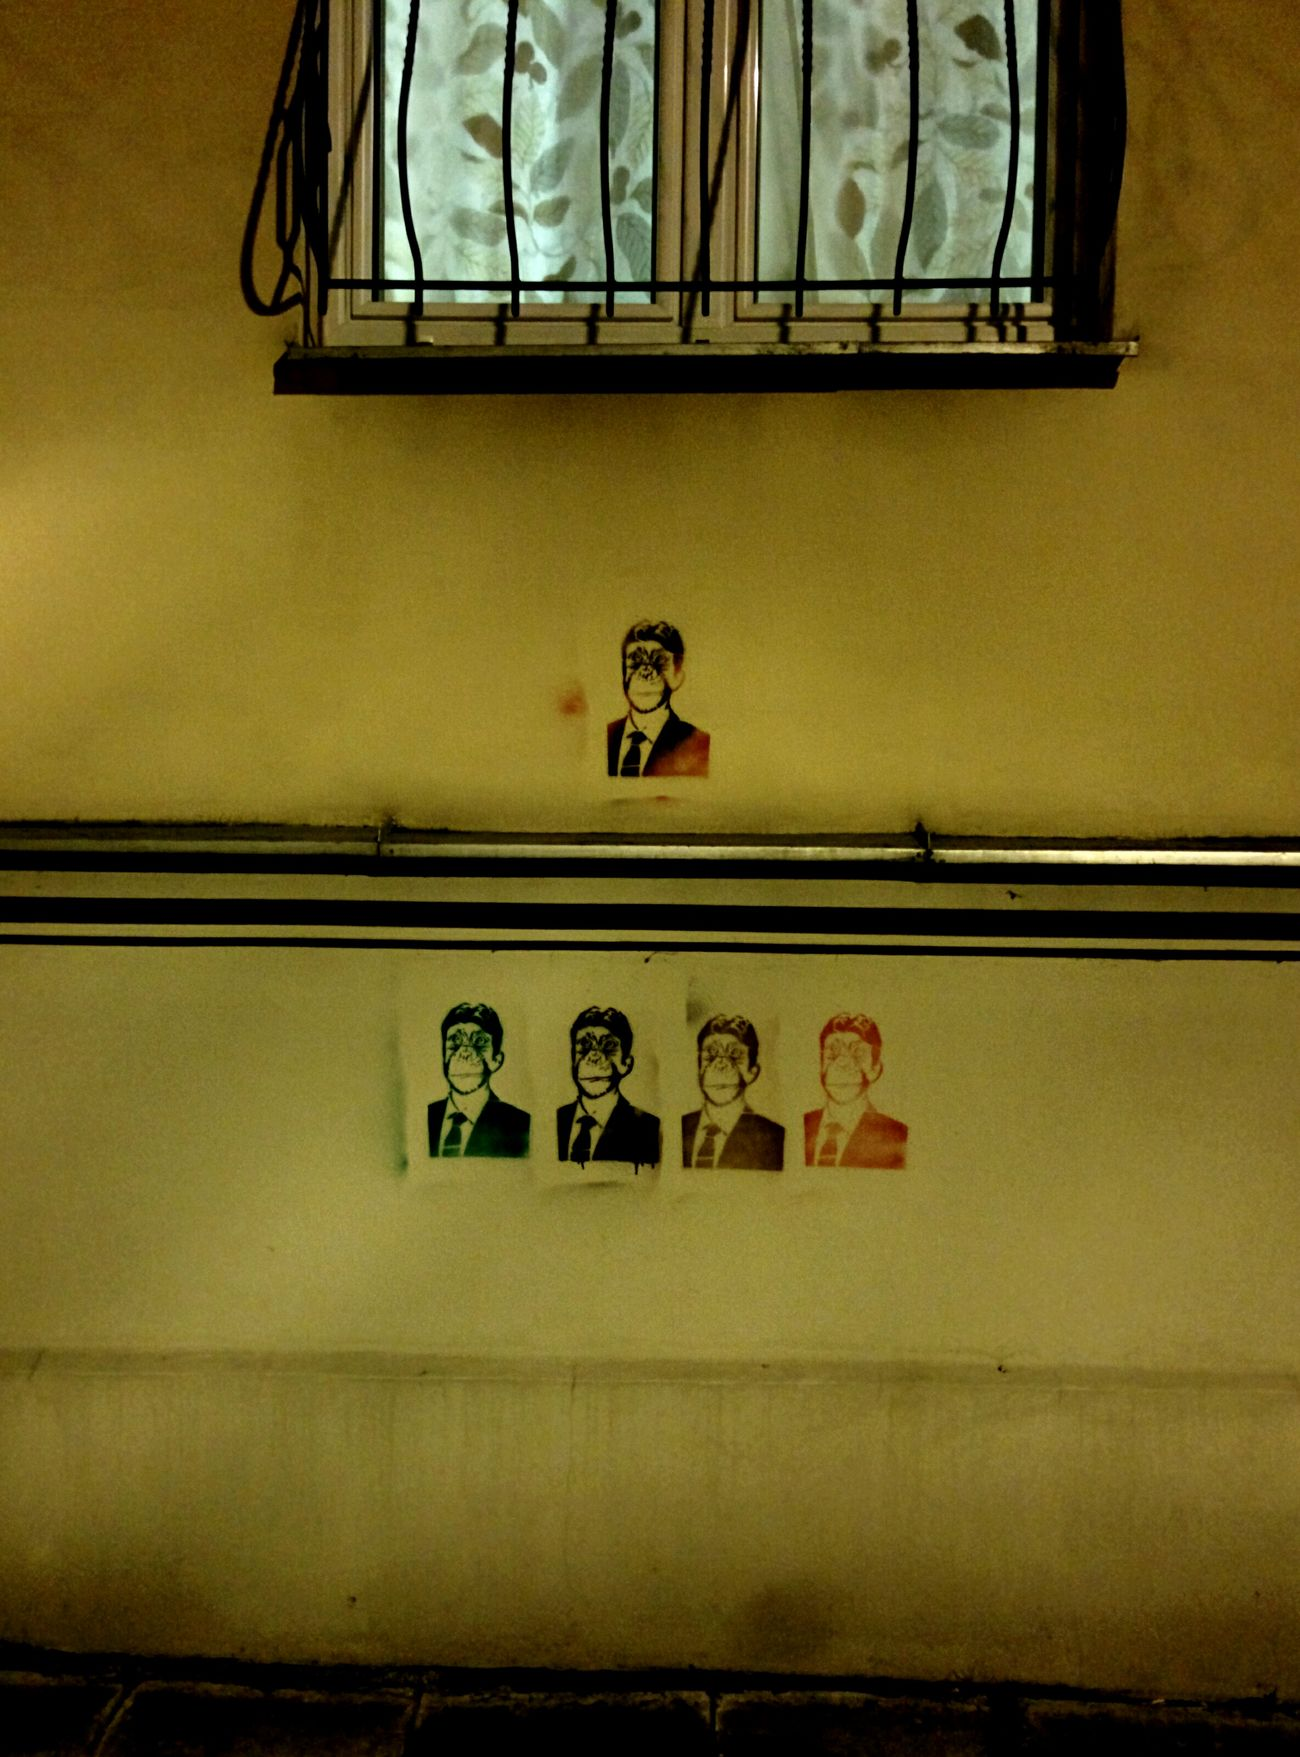 Monkey in suit Mural Streetart Fuckthesystem Żoliborz Warsaw